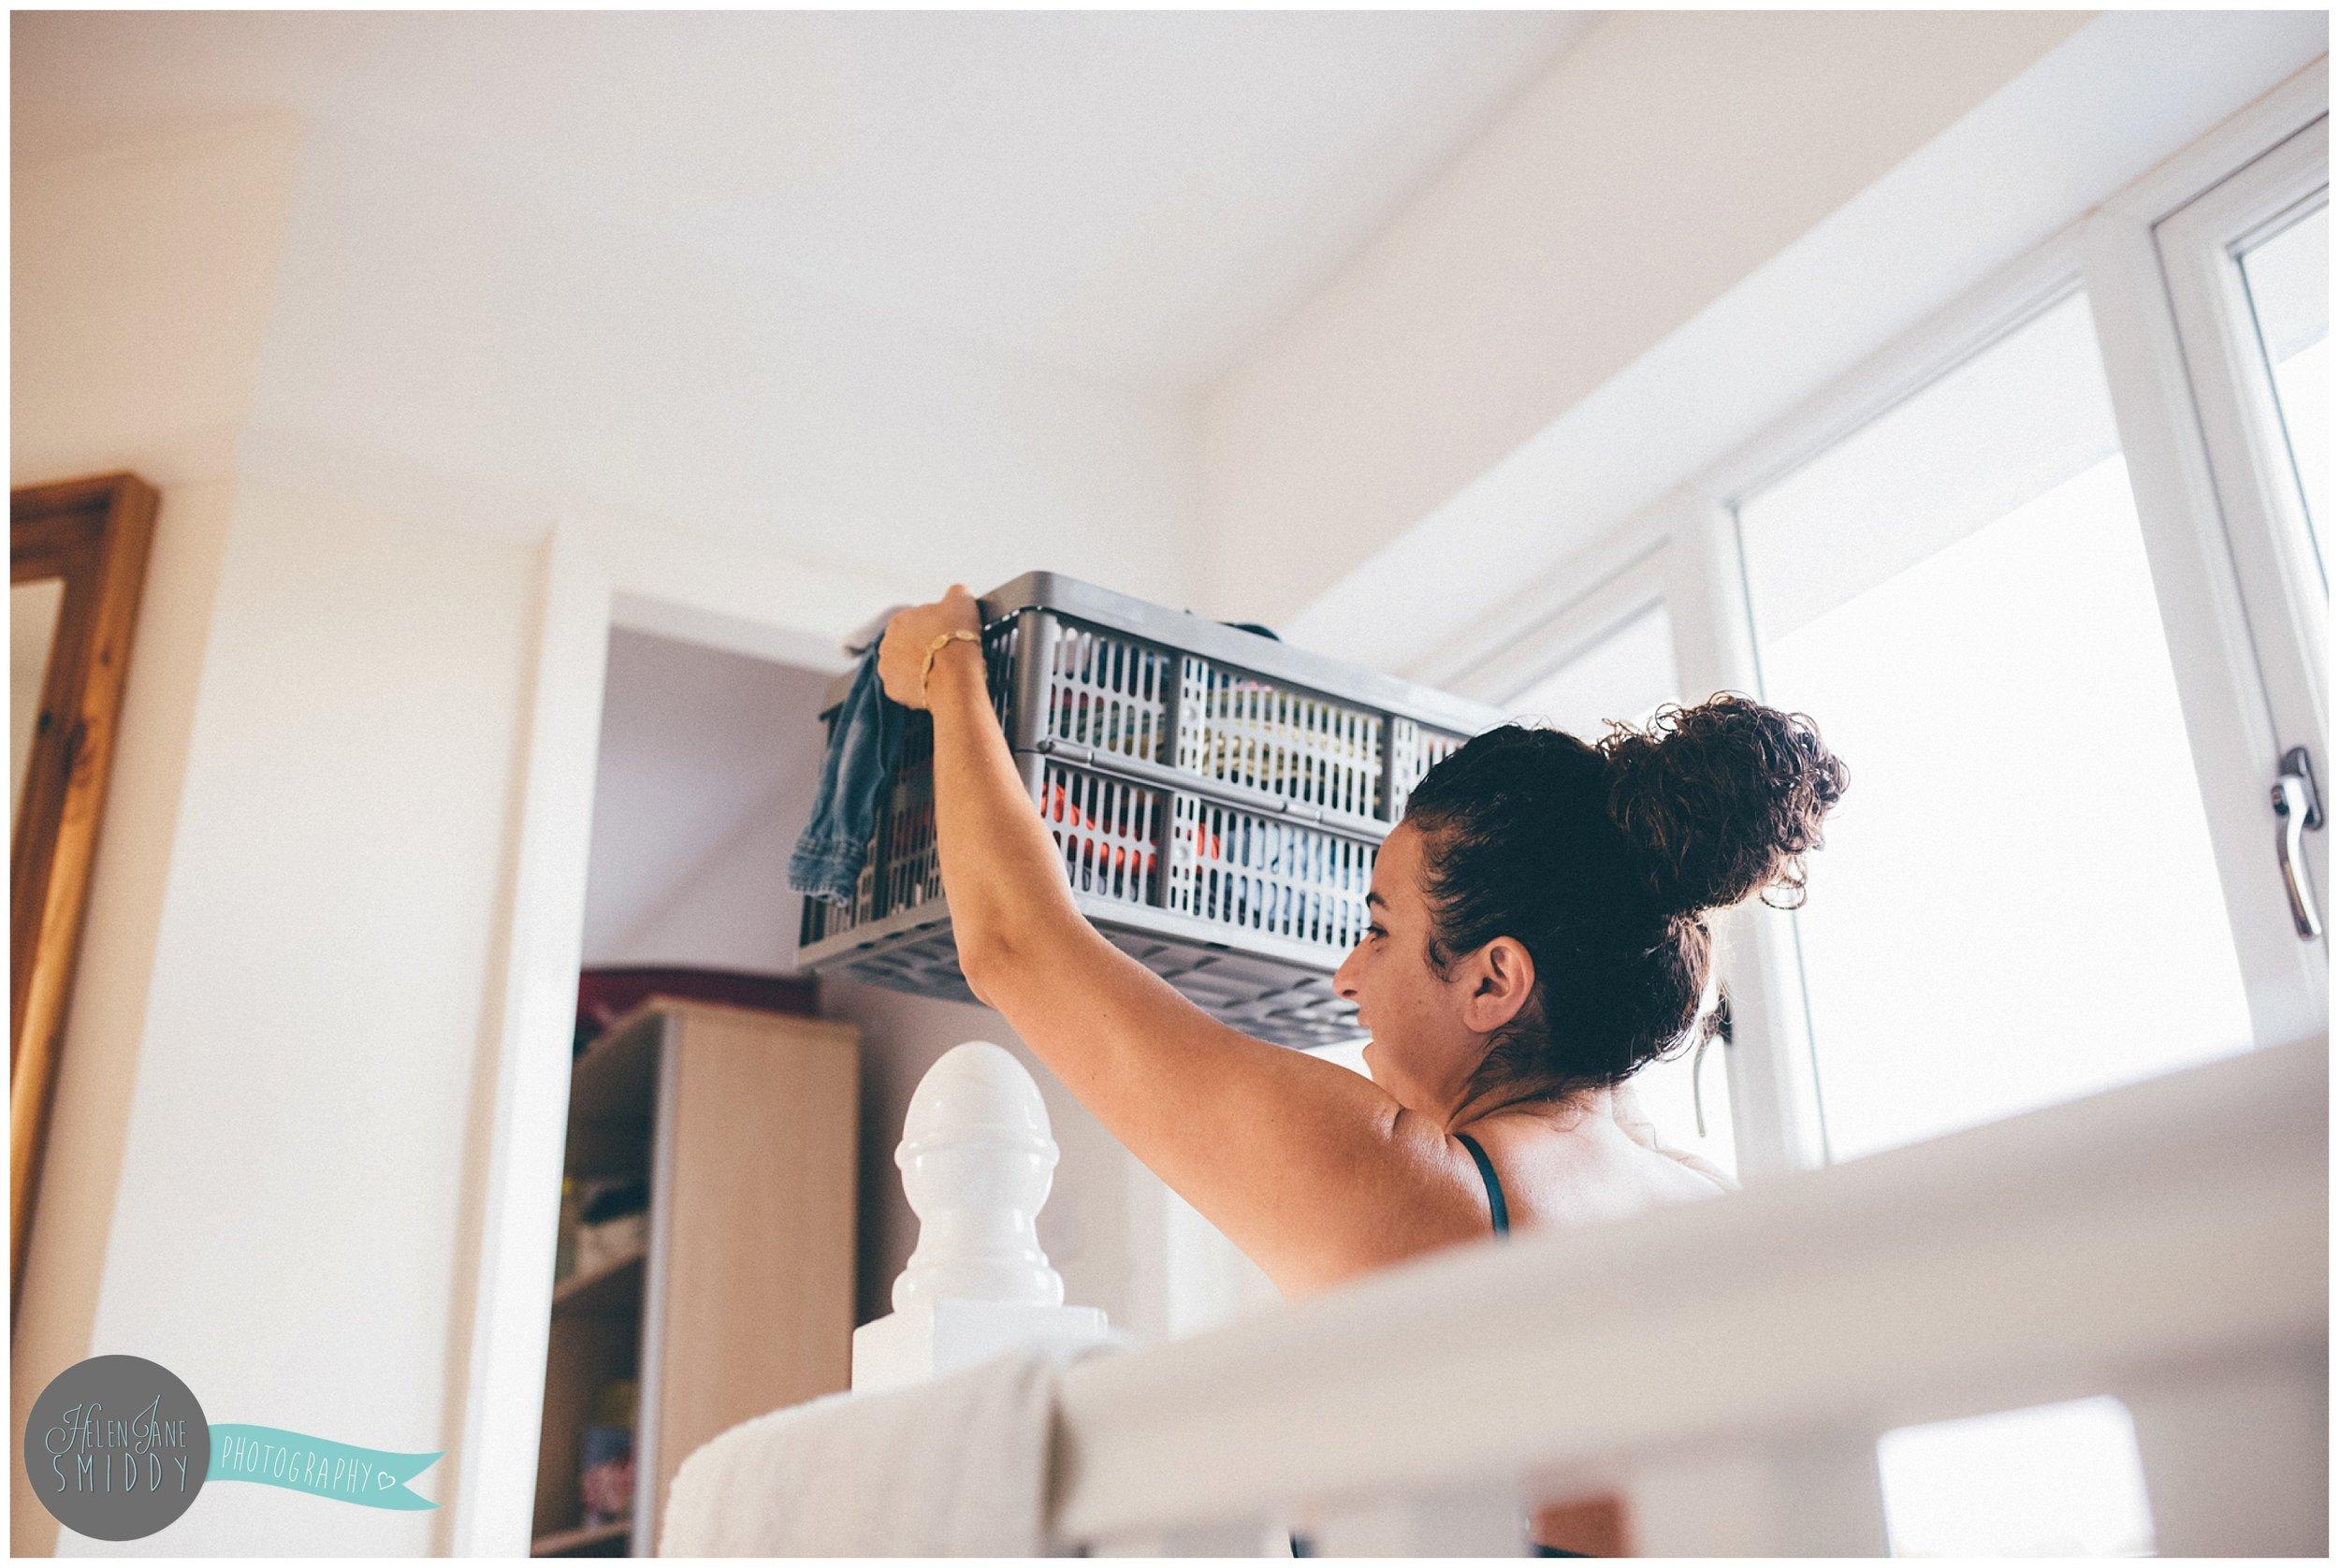 Nina carrying washing upstairs whilst starting her day.